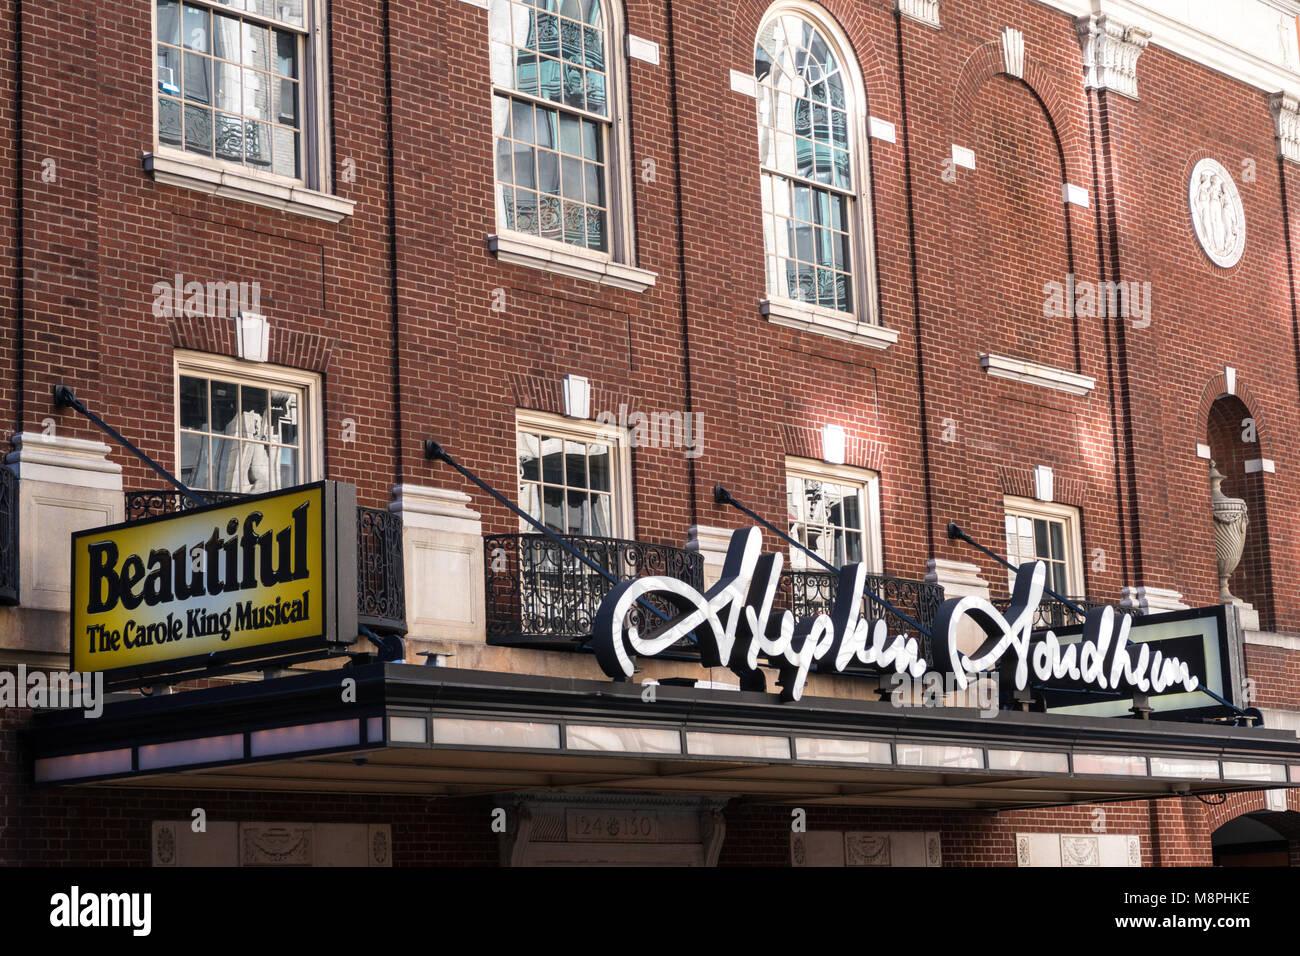 Stephen Sondheim Theater Facade West 43nd Street Nyc Stock Photo Alamy